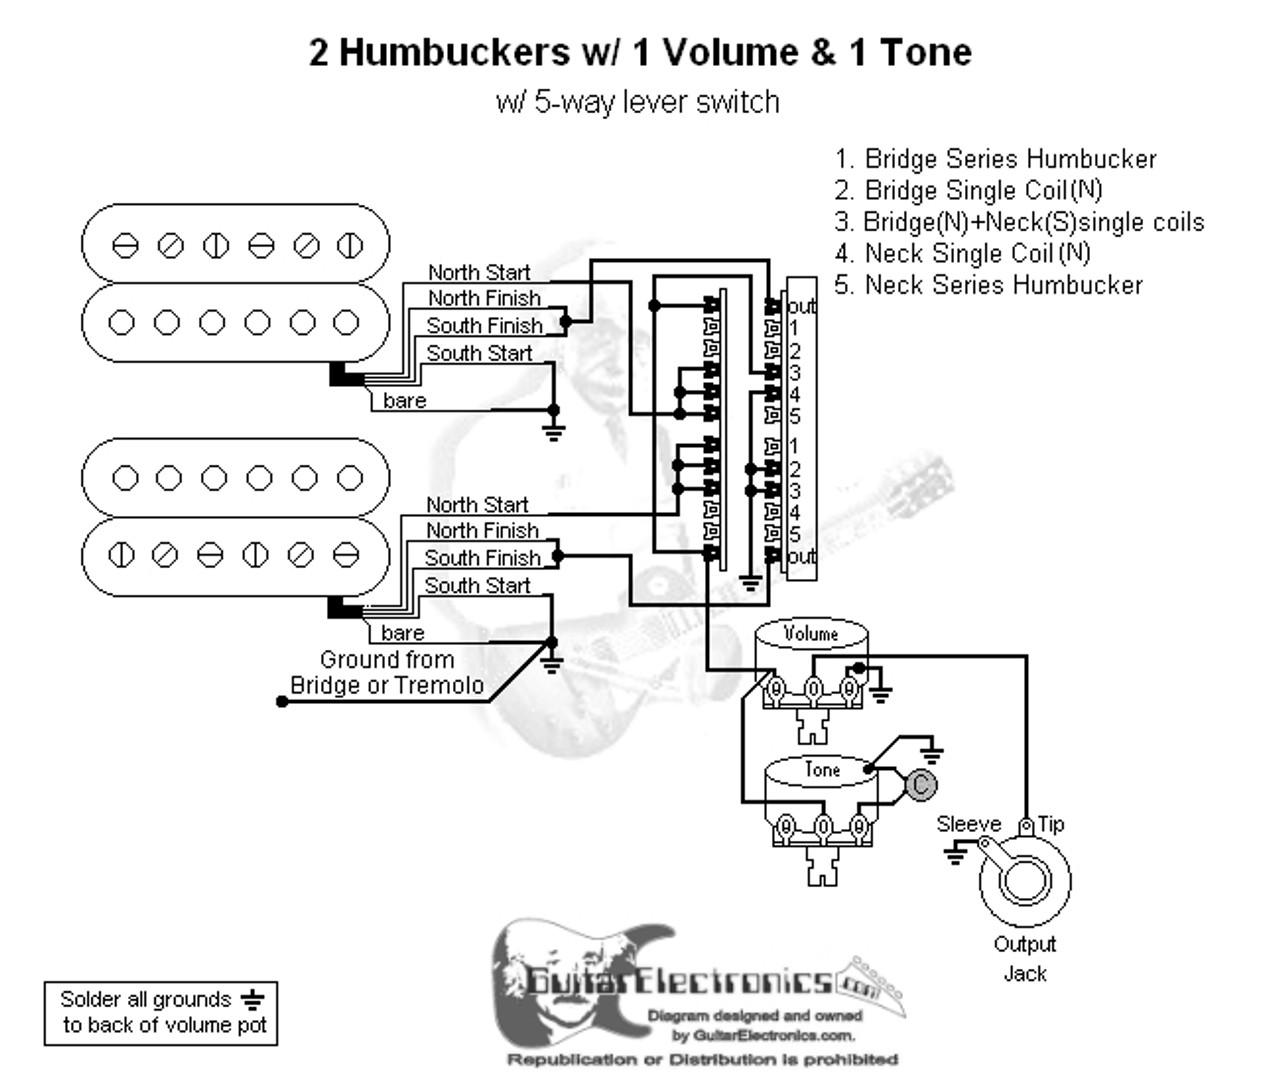 small resolution of 2 humbuckers 1 vol 1 tone 5 way super switch wiring diagram schema2 humbuckers 5 way lever switch 1 volume 1 tone 01 2 humbuckers 1 vol 1 tone 5 way super